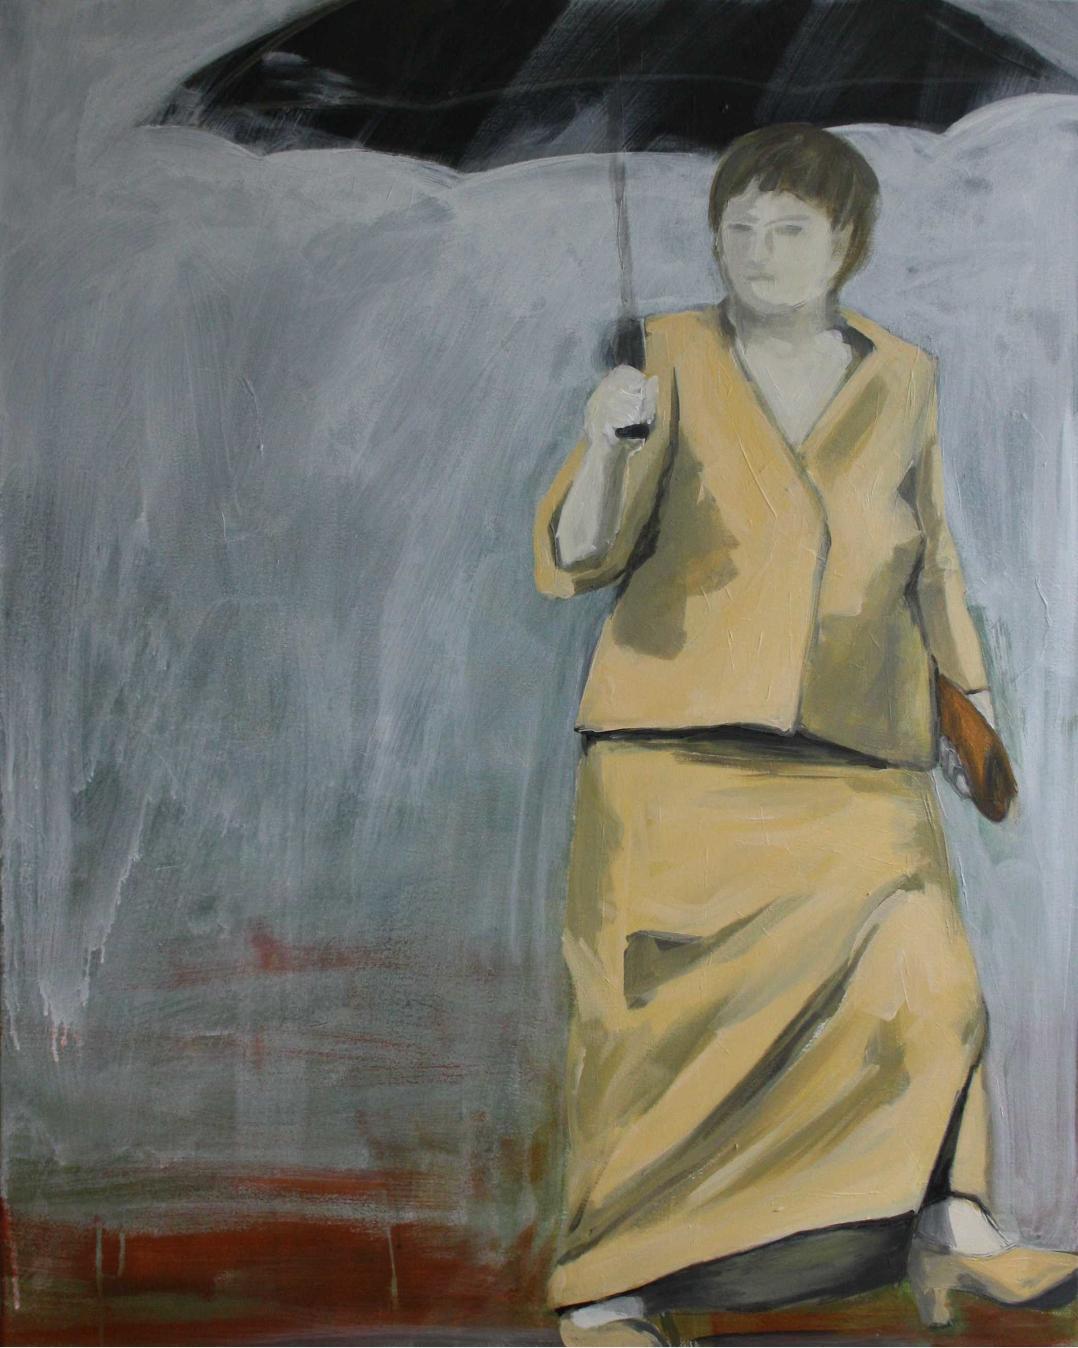 Ohne Titel, Acryl auf Leinwand, 80x100cm